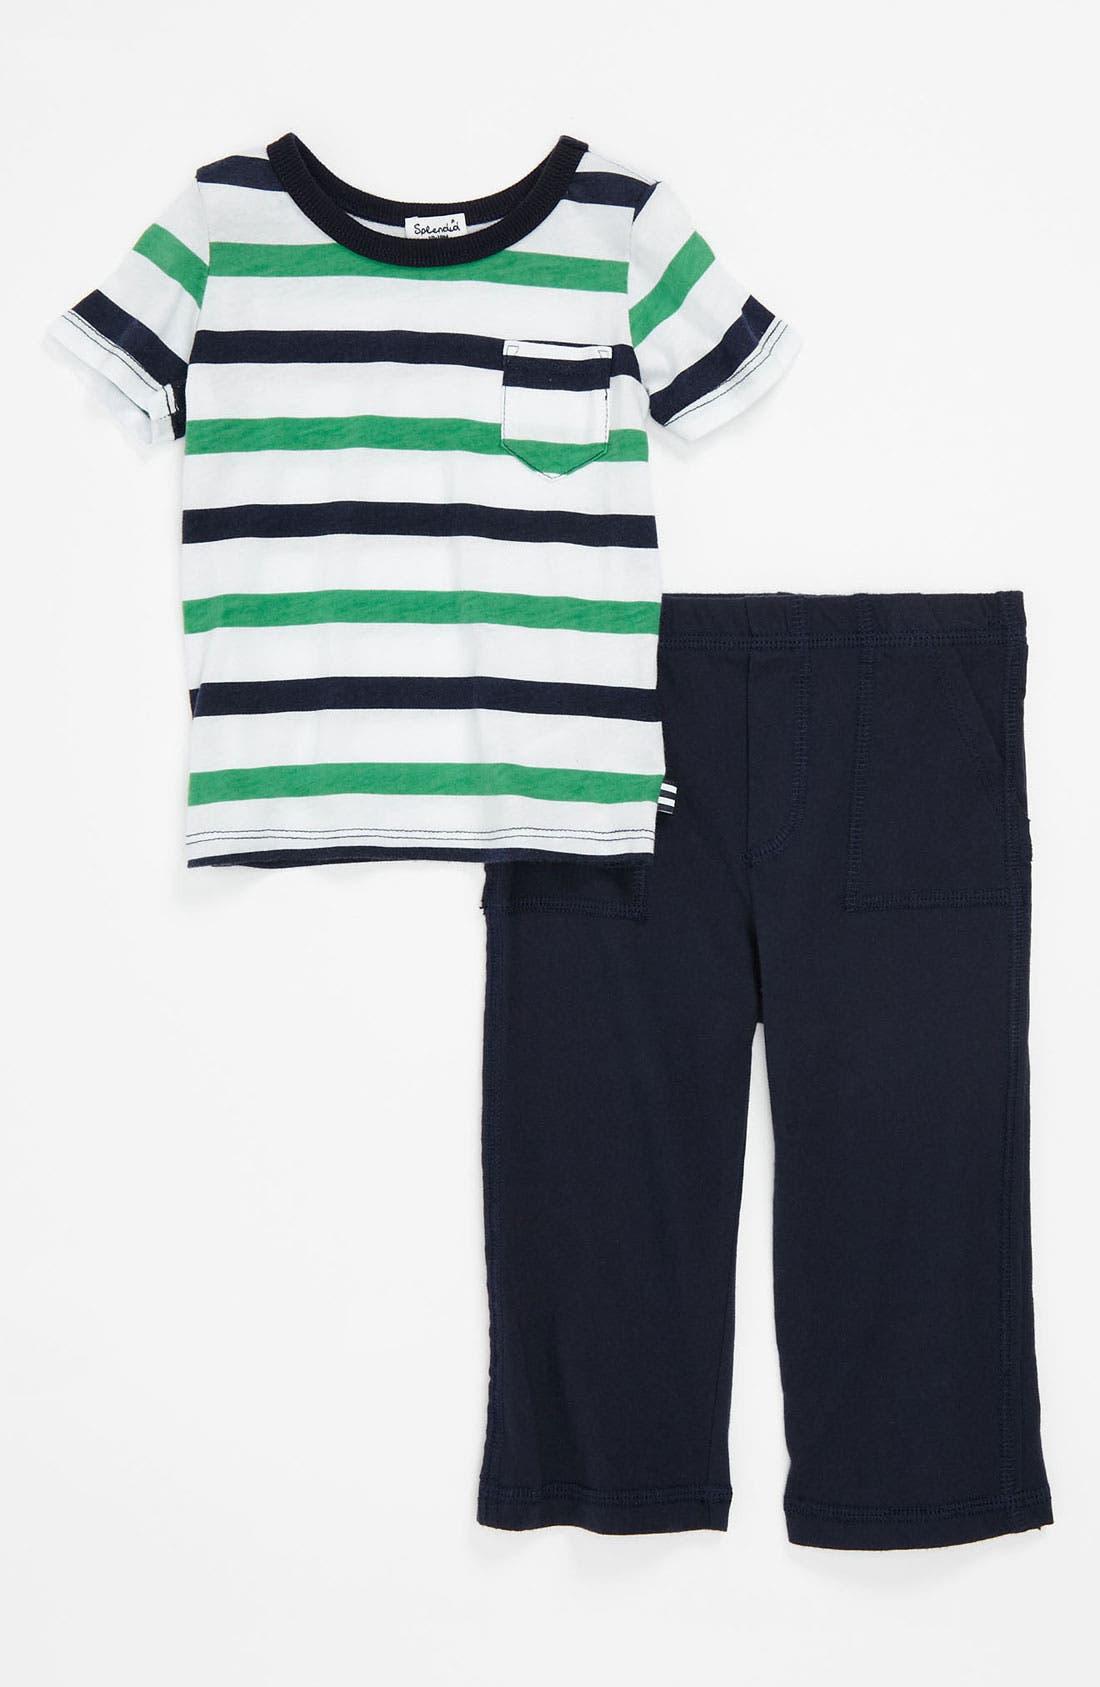 Alternate Image 1 Selected - Splendid Shirt & Pants (Infant)